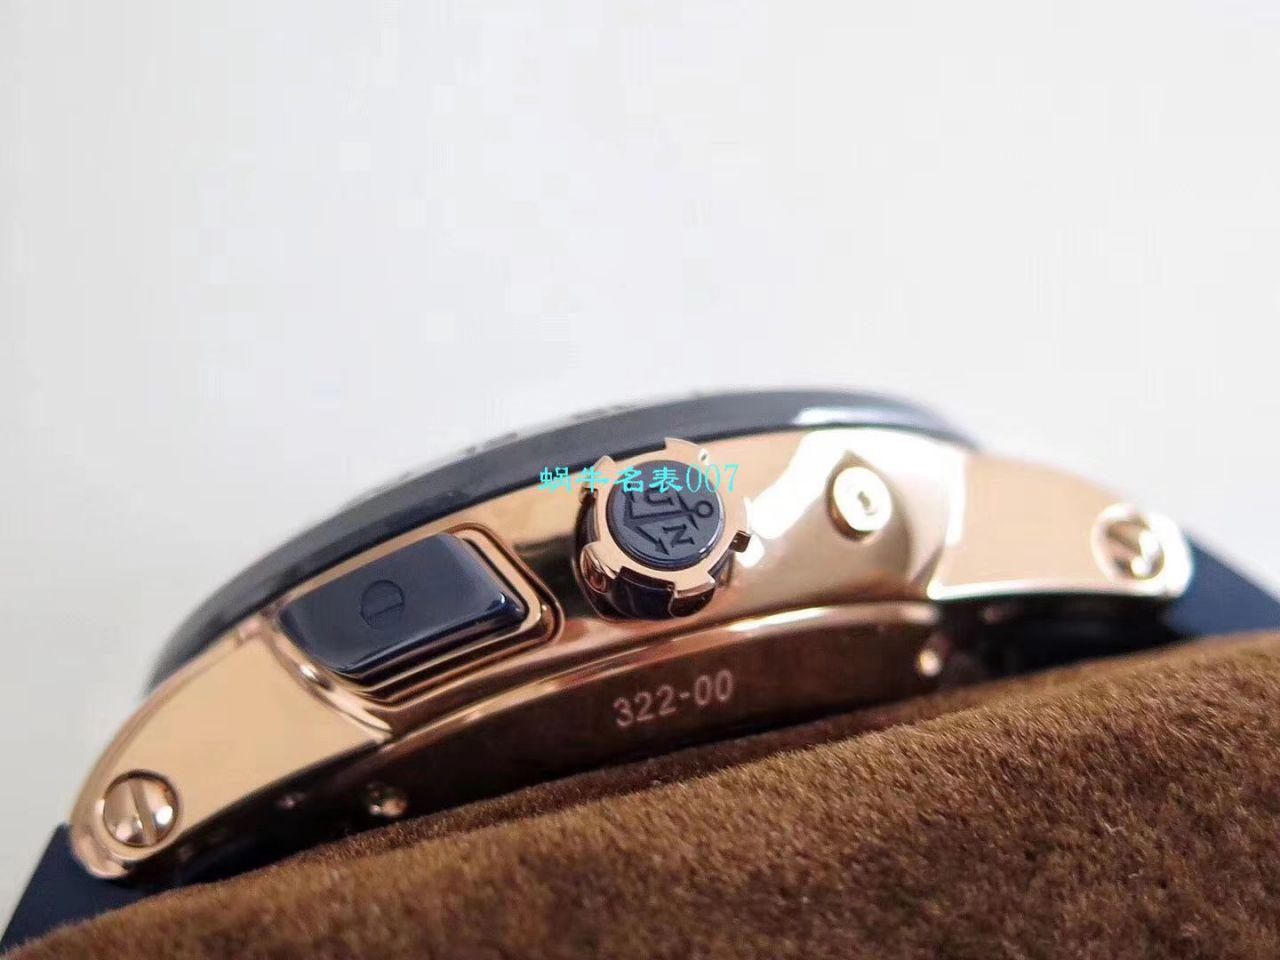 【Ulysse Nardin复刻手表】TWA厂雅典复杂功能系列326-00-3腕表 / YD020